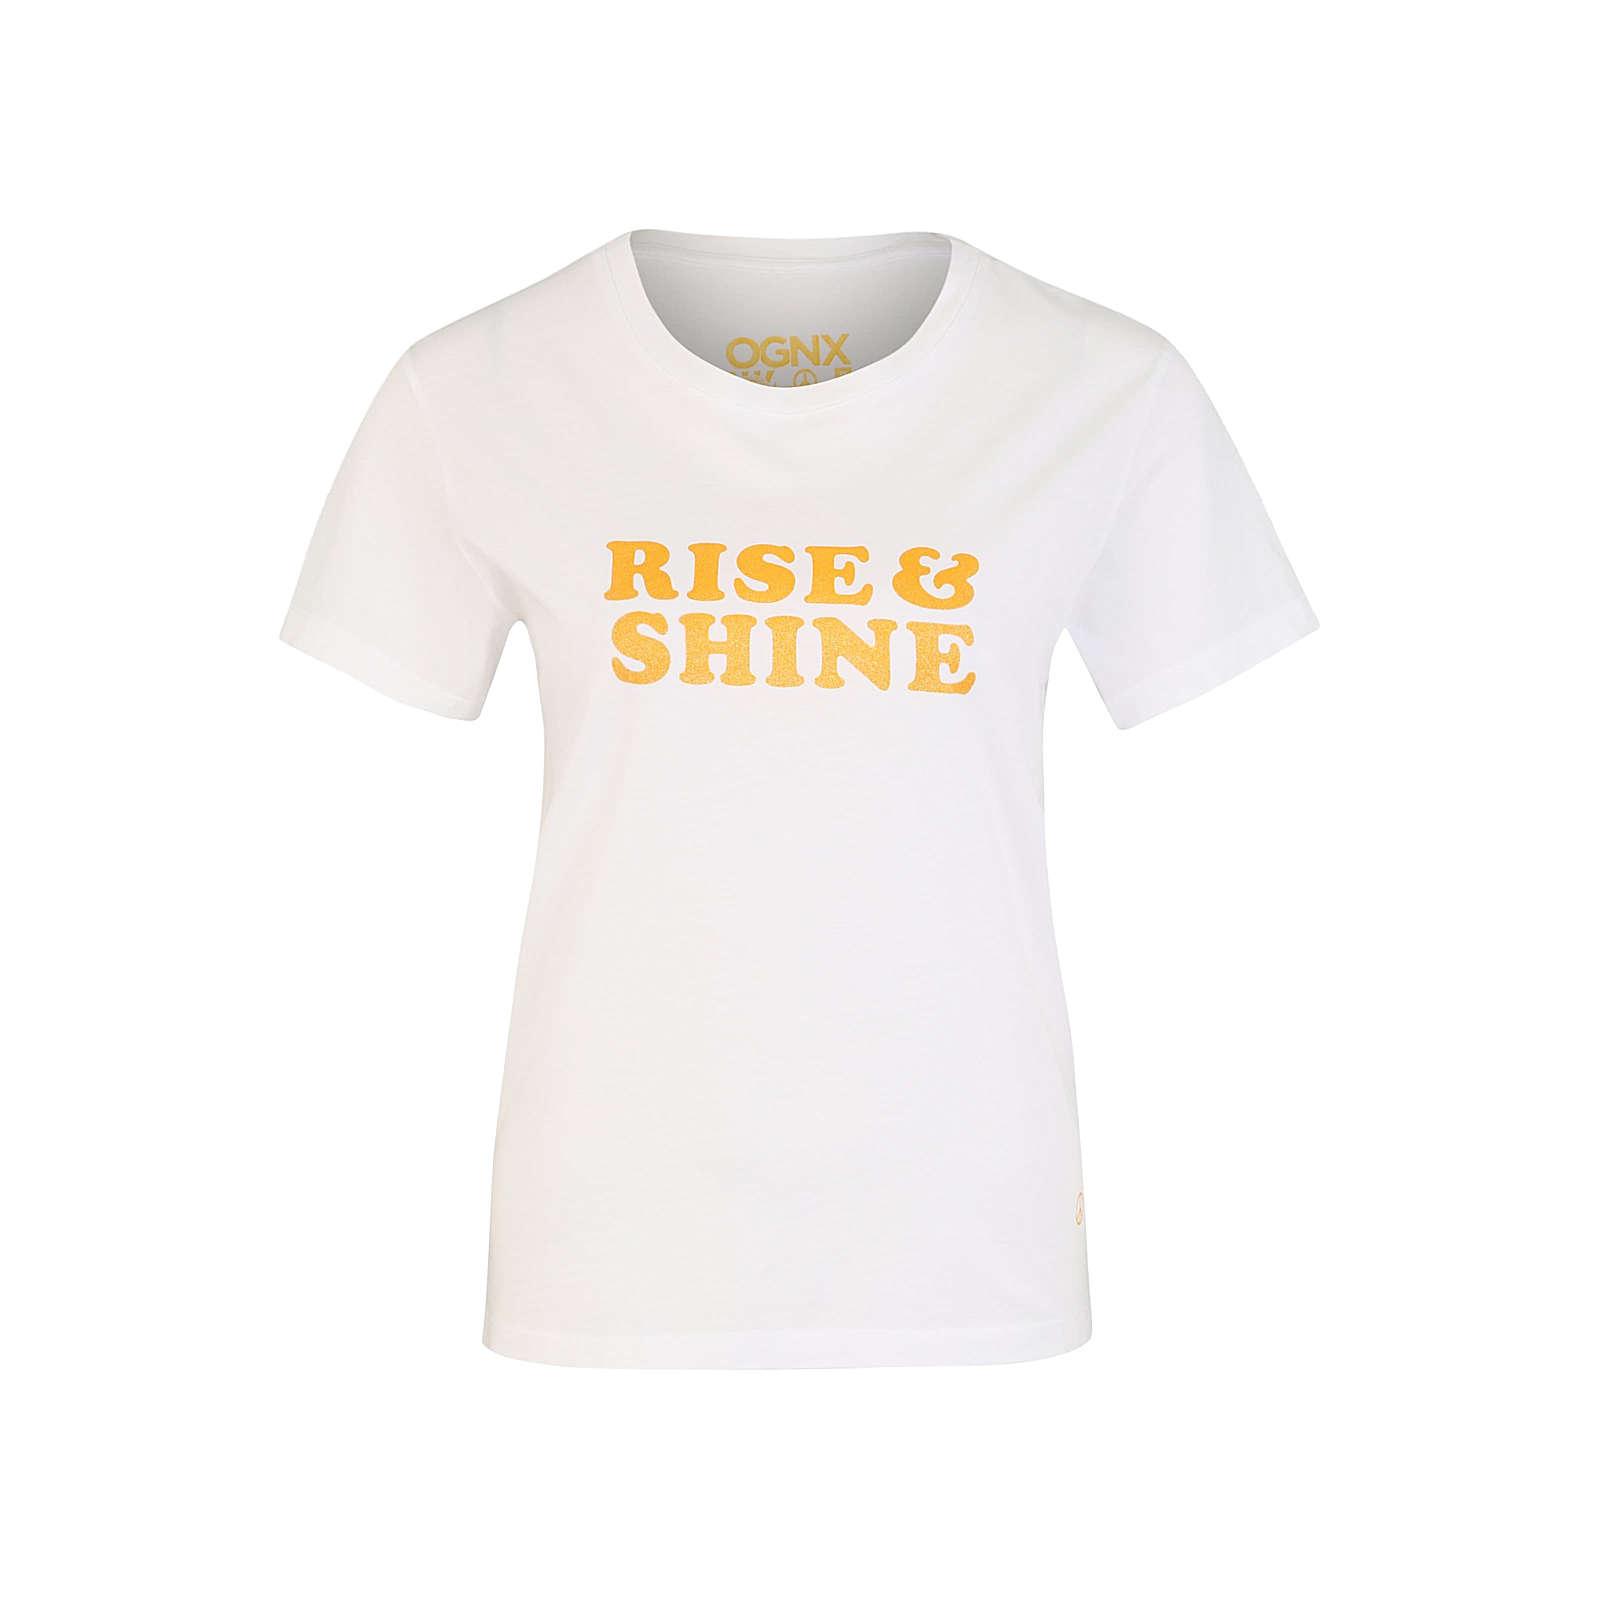 OGNX Funktionsshirt Rise & Shine Funktionsshirts weiß Damen Gr. 42